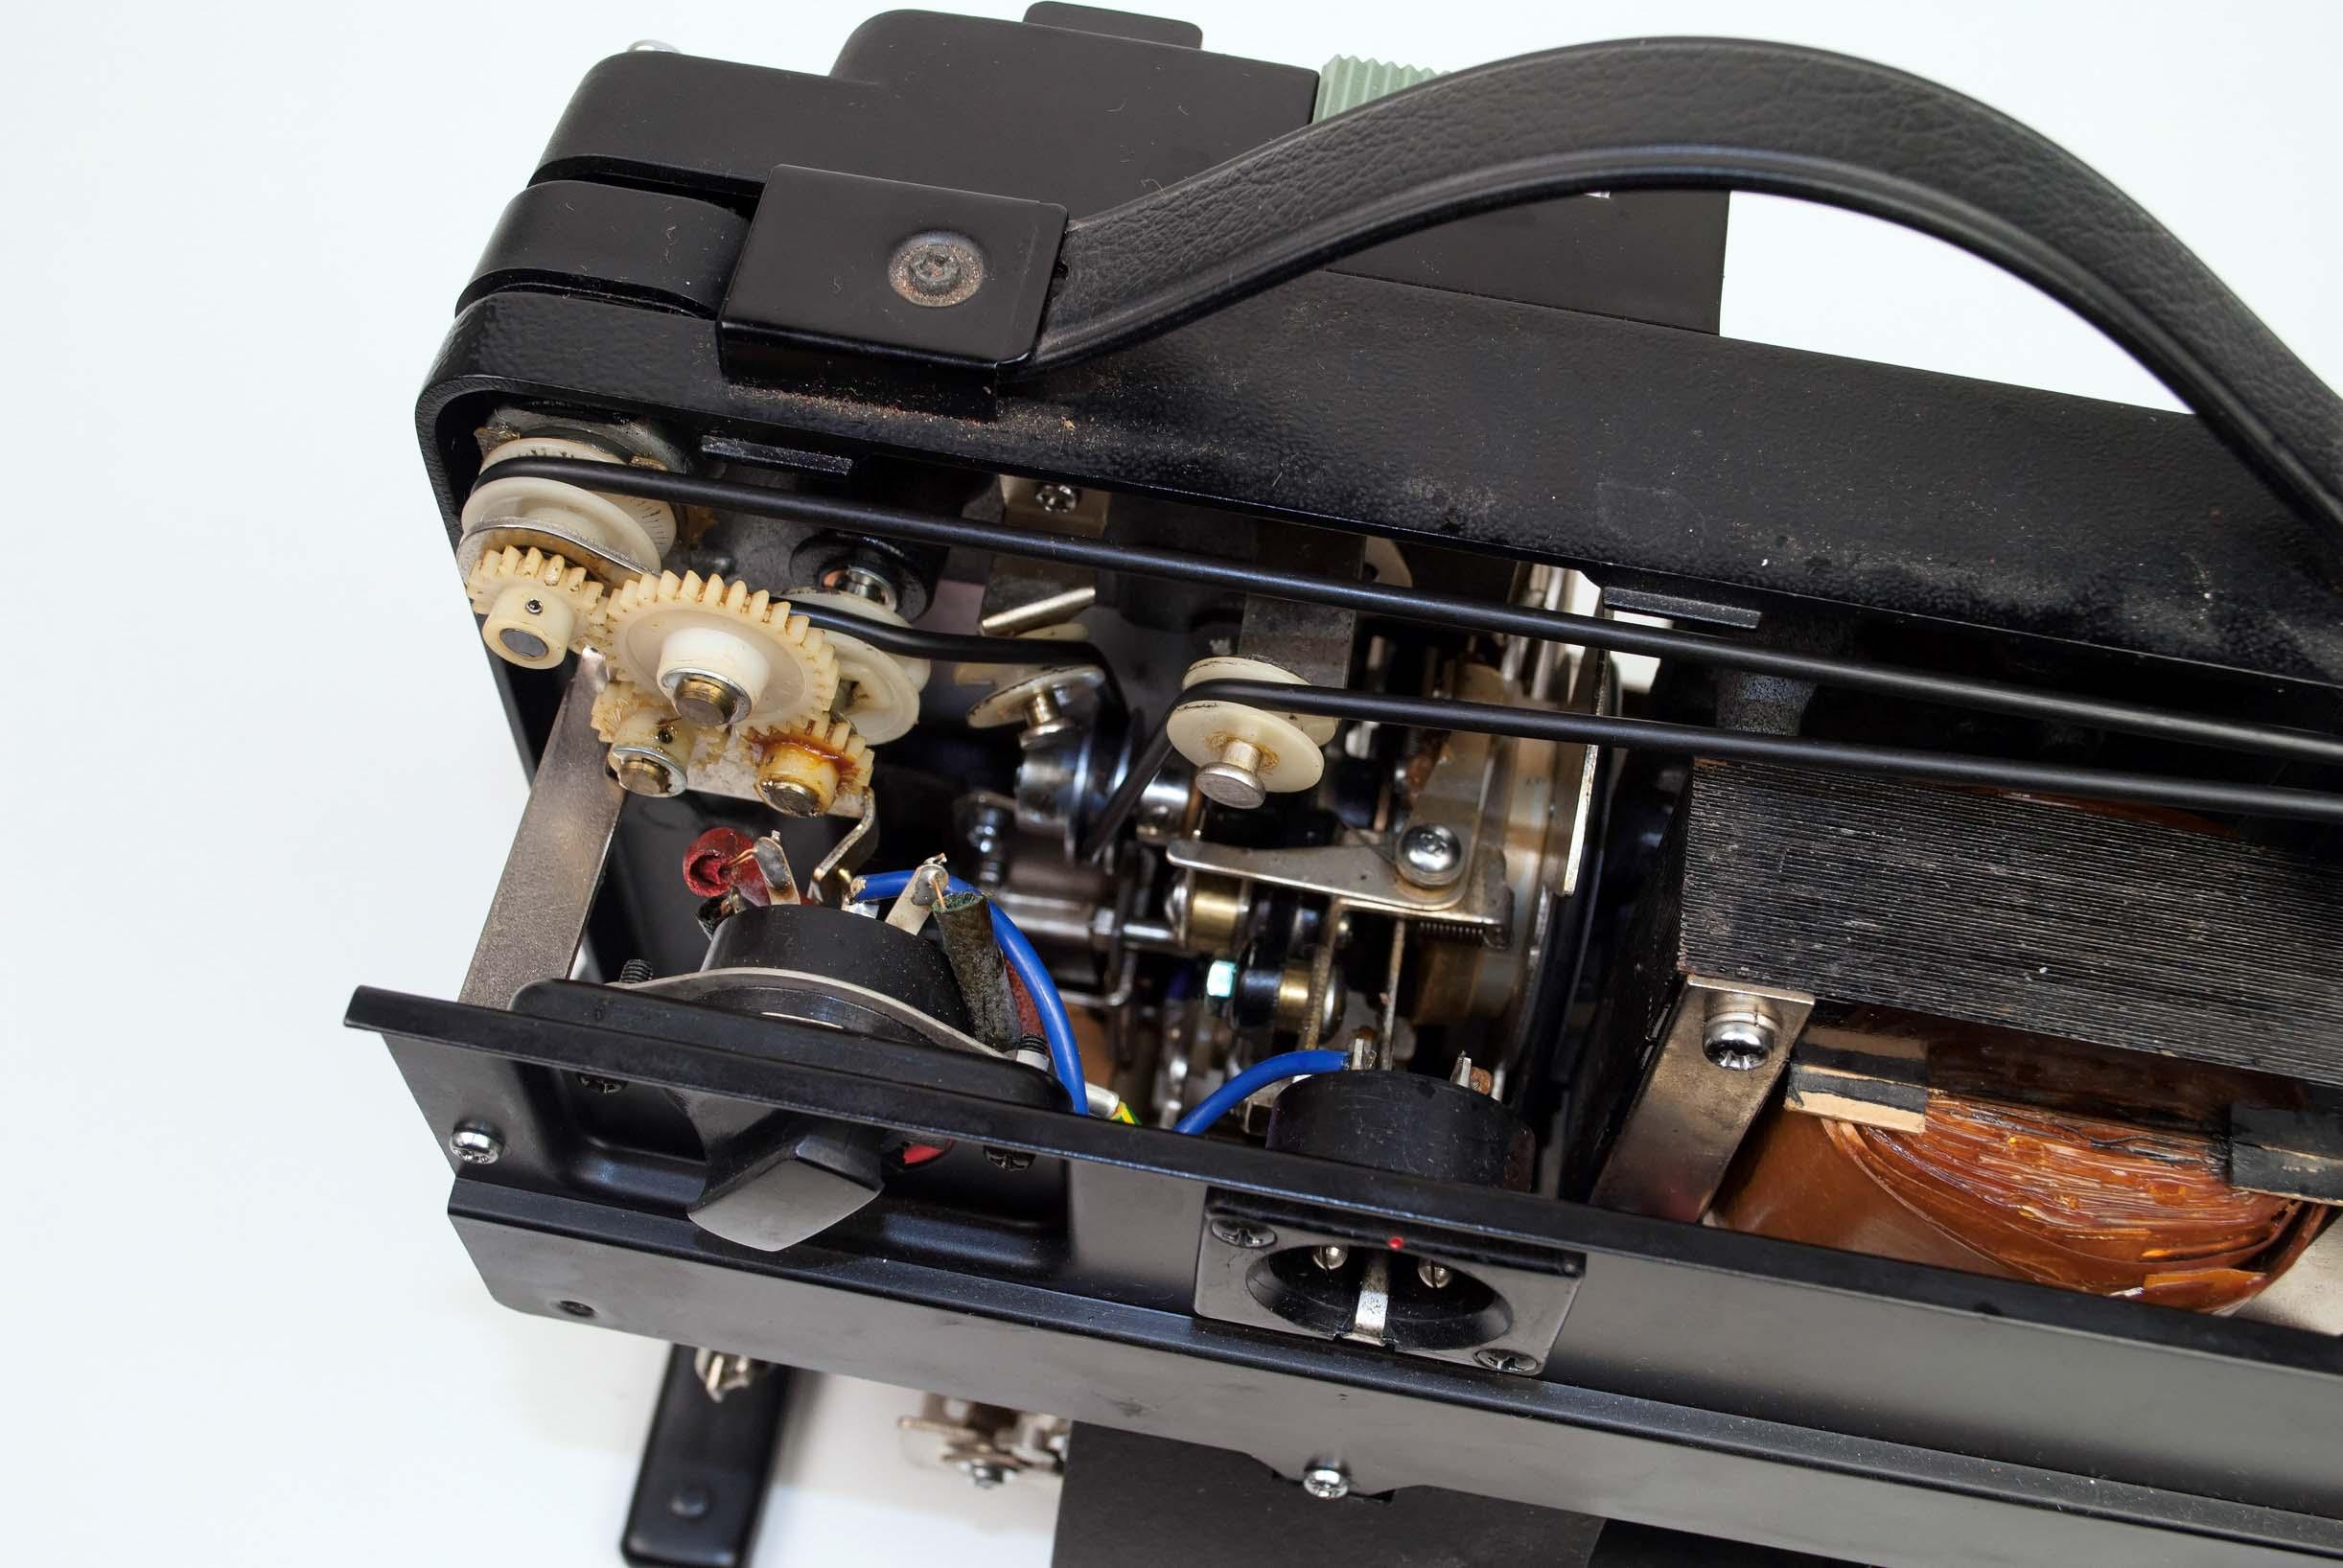 elmo vp a film projectors spare parts and information van eck video services. Black Bedroom Furniture Sets. Home Design Ideas